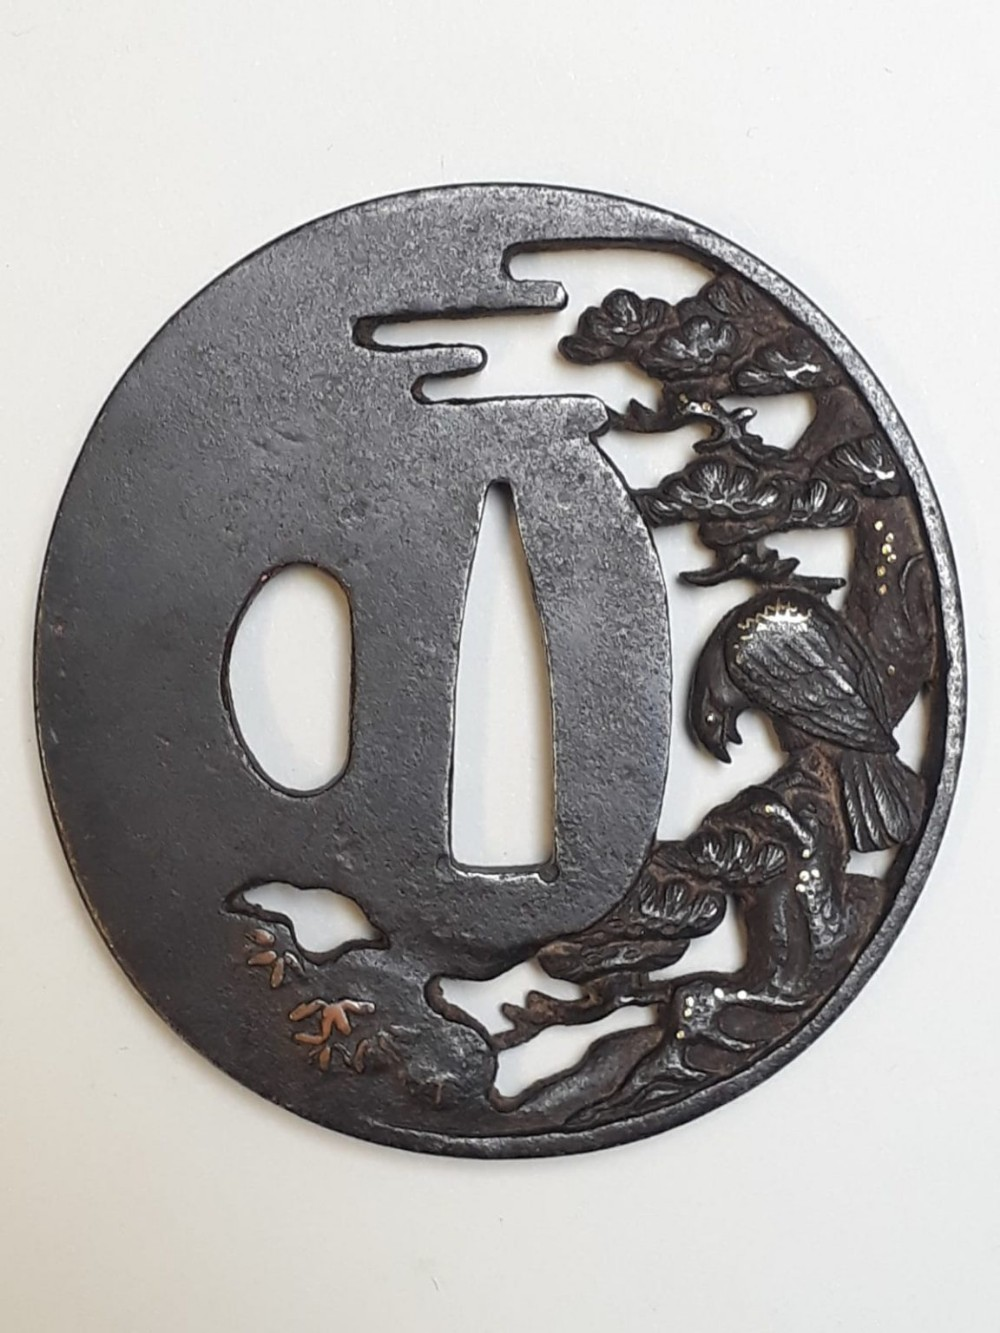 japanese iron tsuba with a hawk